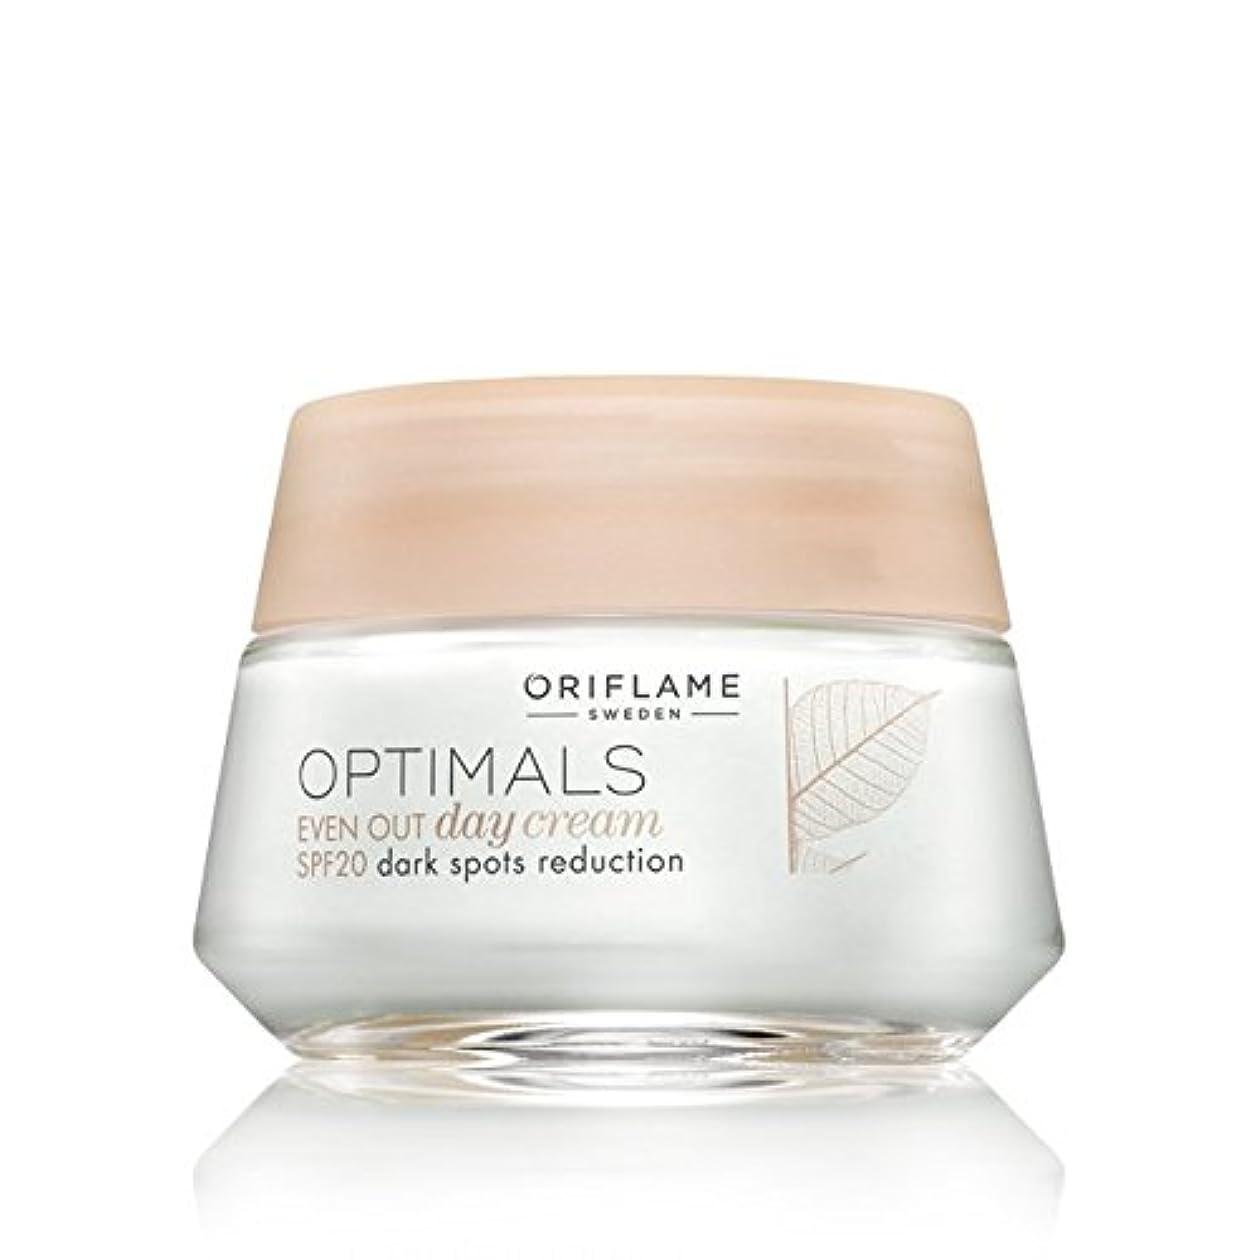 Oriflame Optimals SPF 20 Dark Spot Reduction Even Out Day Cream, 50ml